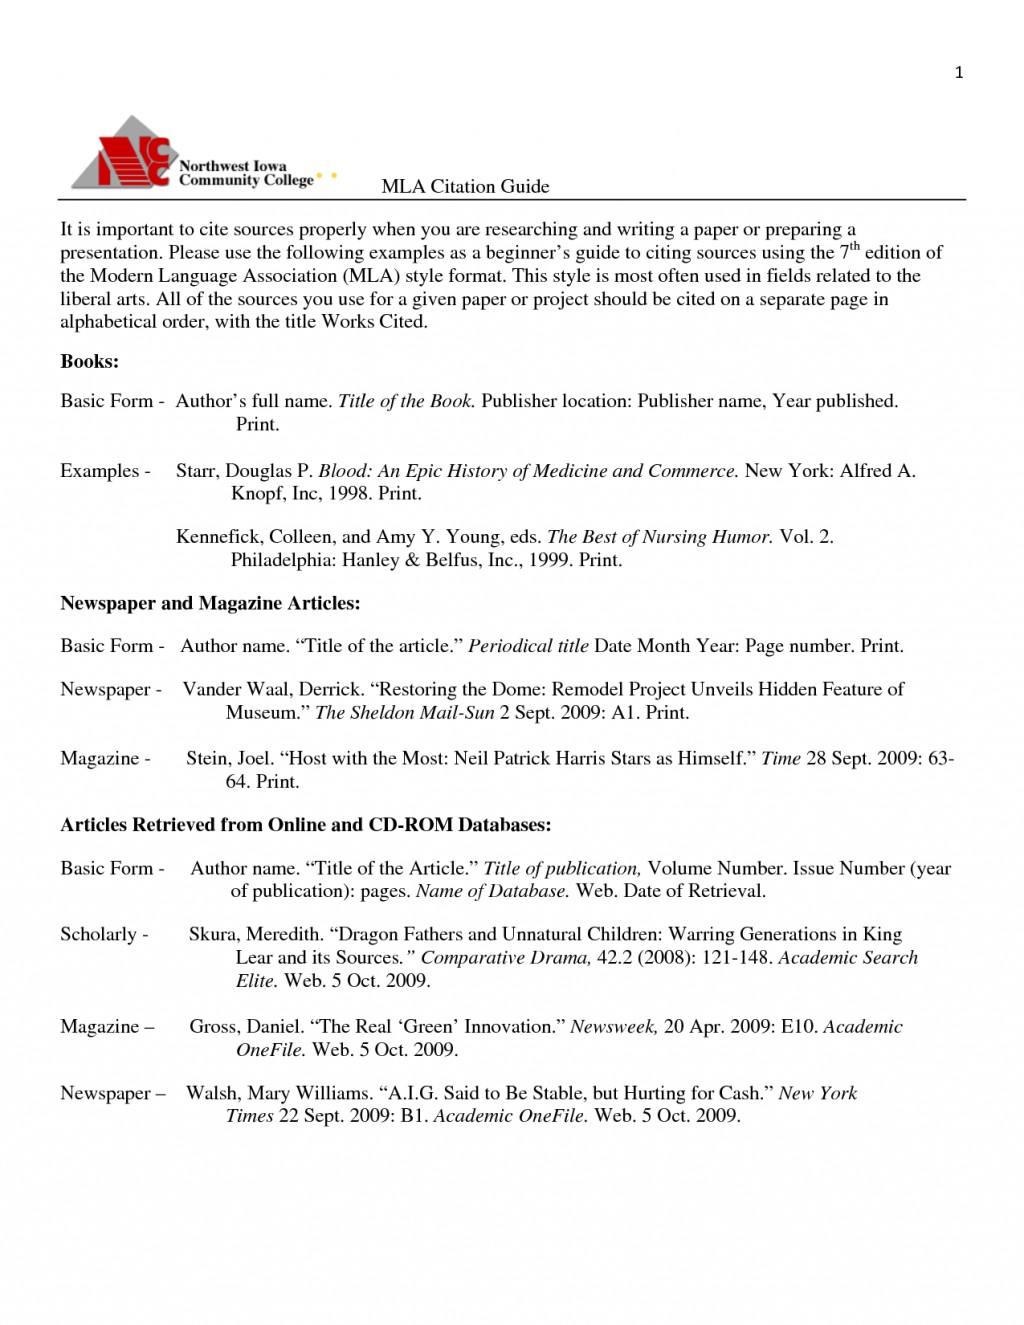 012 Essay Example Proper Form Citation Mla Format Citations Formidable Paper Reflection Large